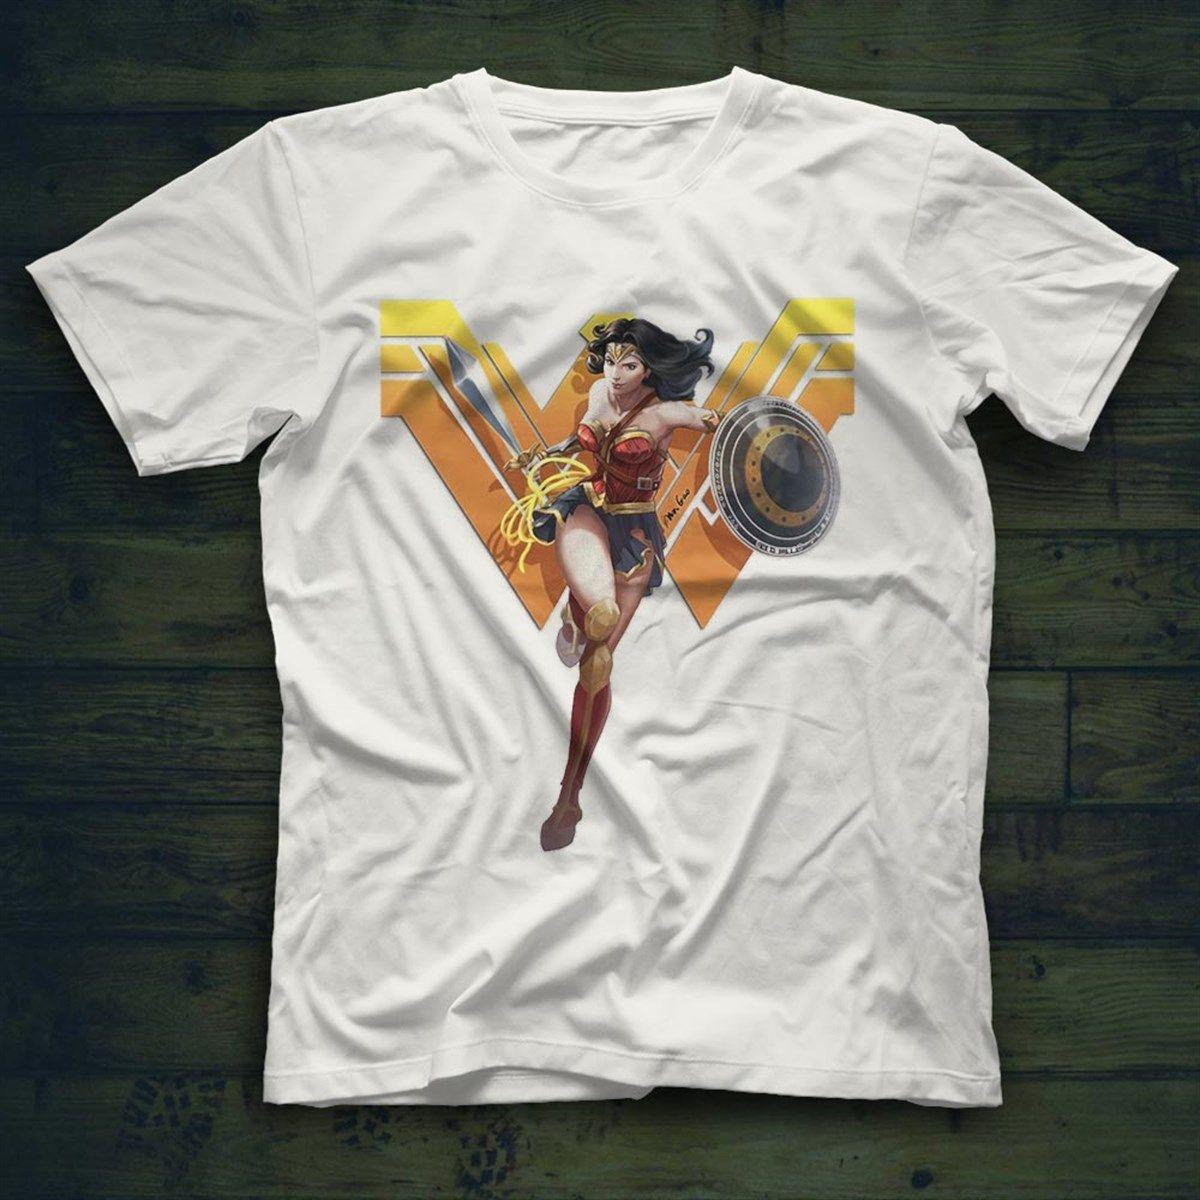 Wonder Woman Unisex S Shirts